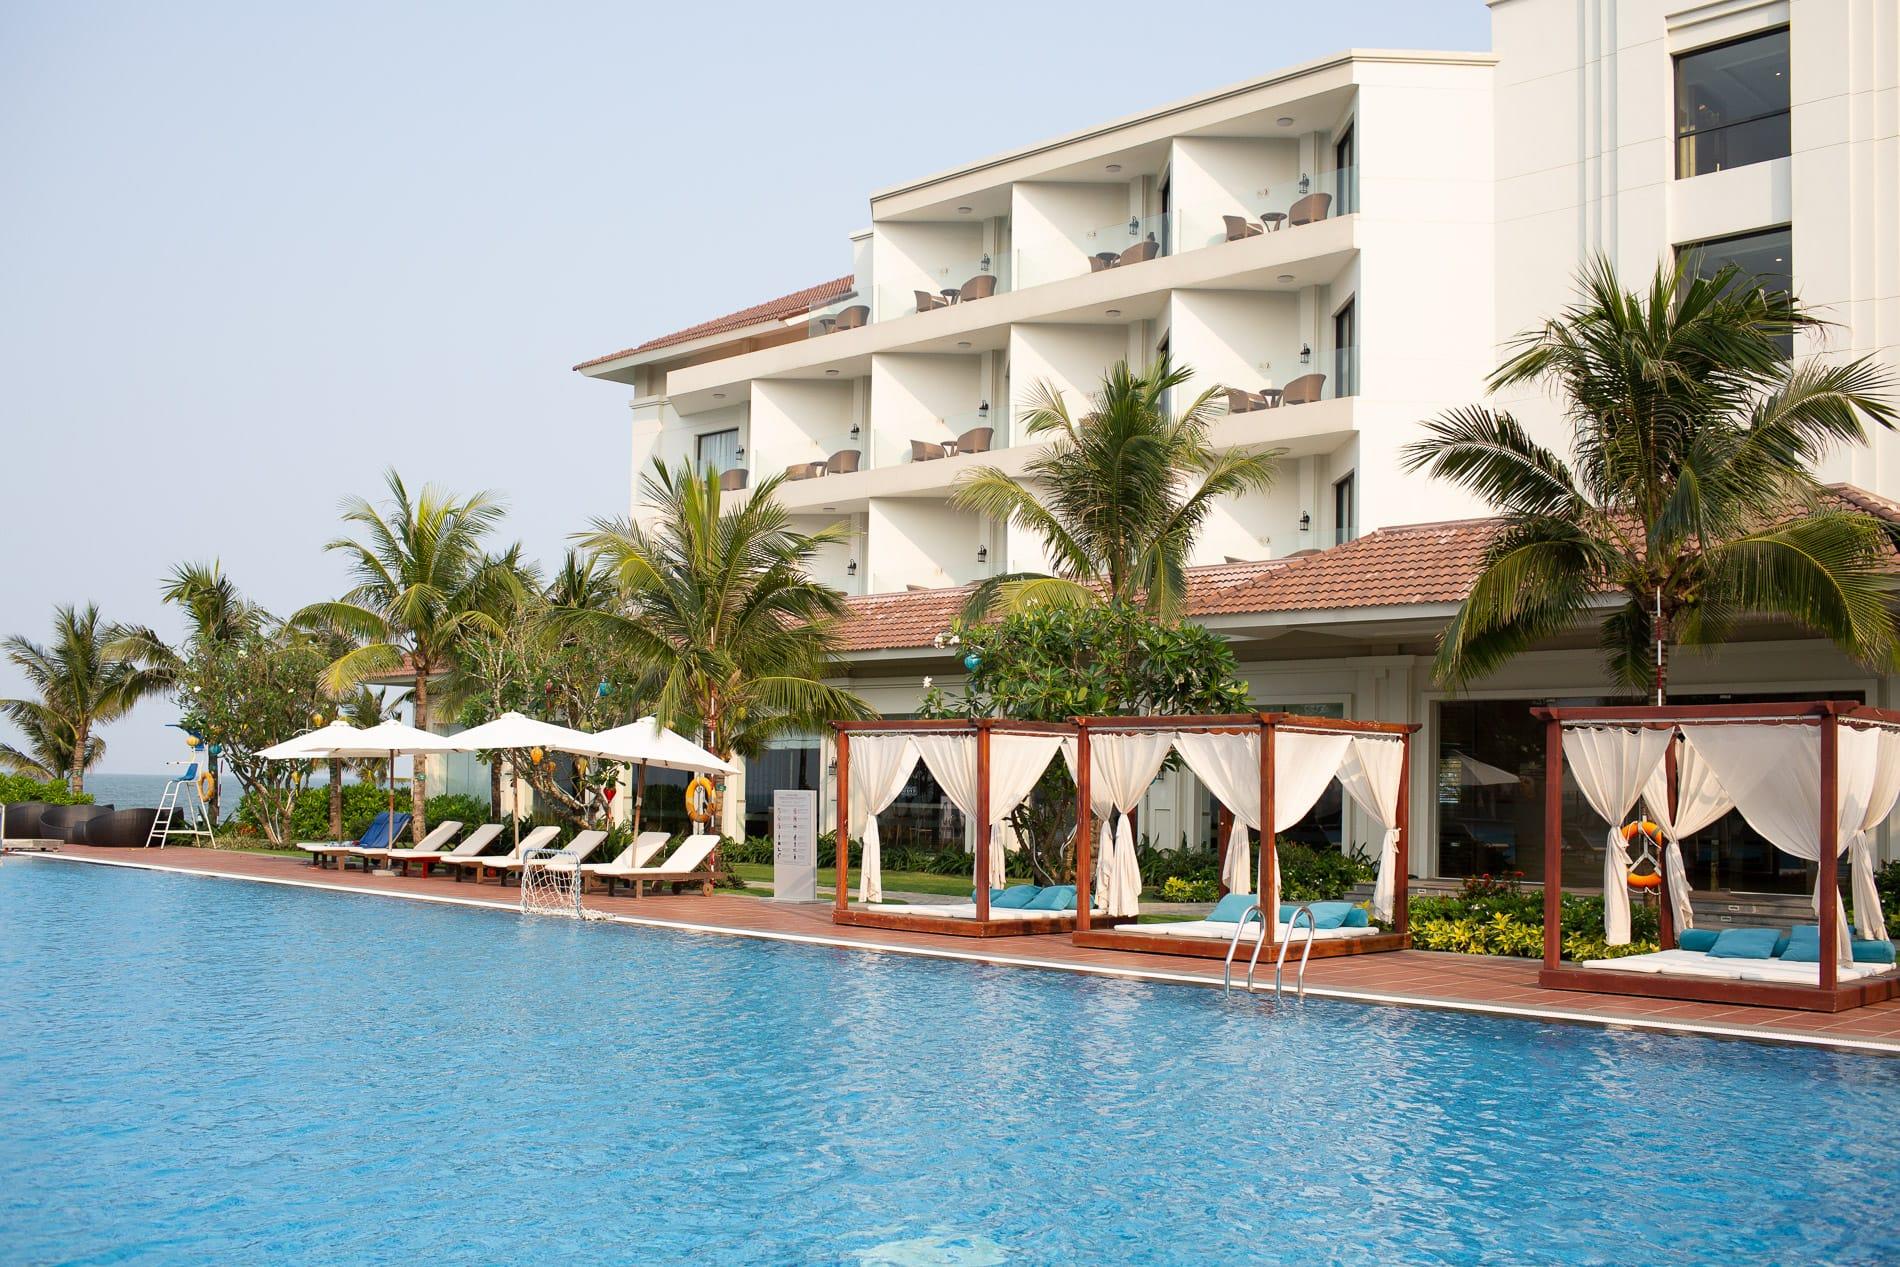 Vinpearl Resort - Hoi An Beach Resorts